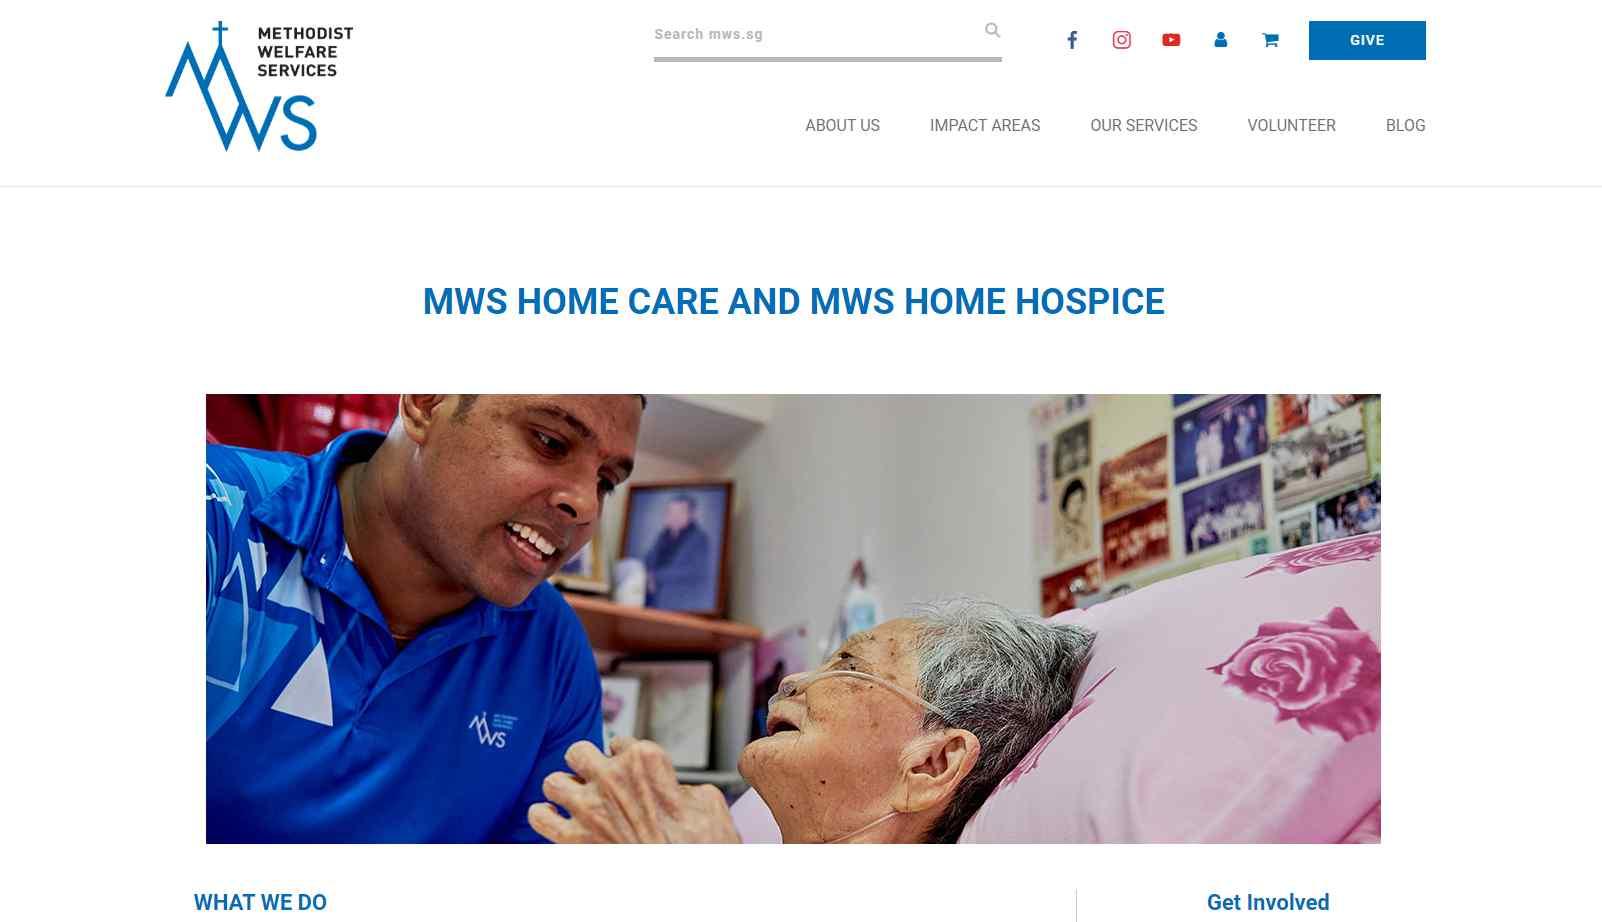 methodist Top Palliative Care Services in Singapore